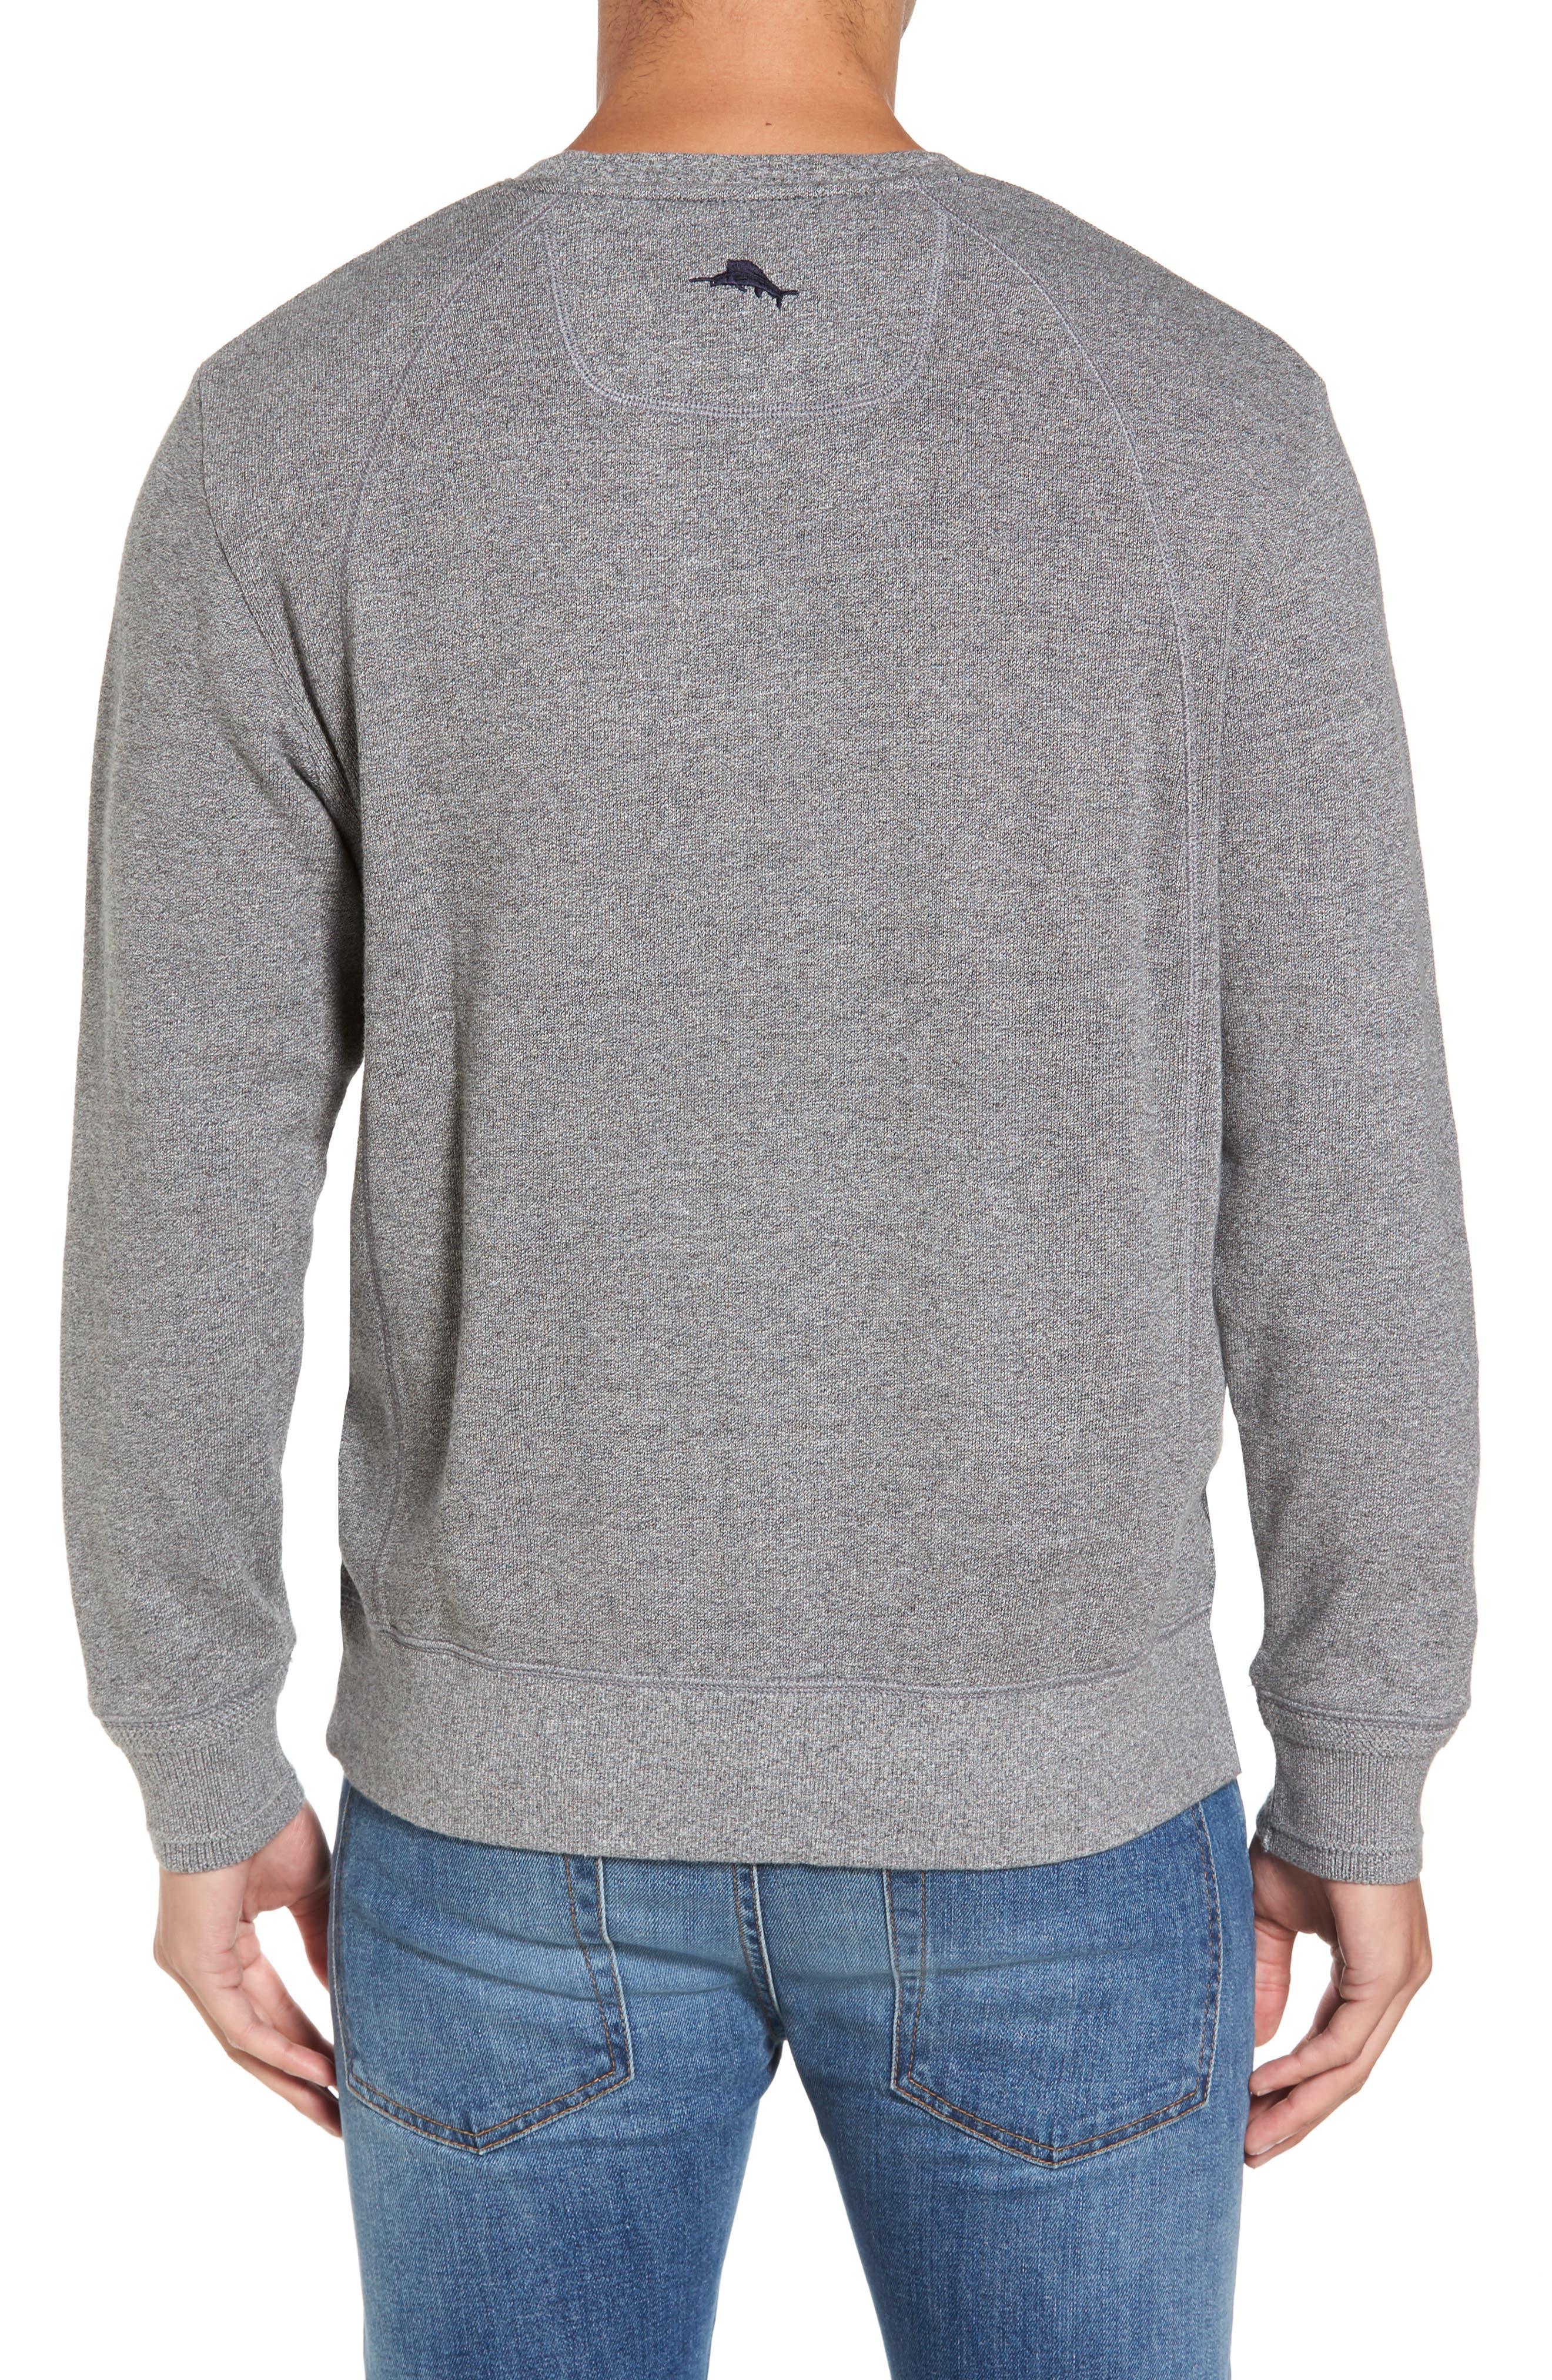 NFL Stitch of Liberty Embroidered Crewneck Sweatshirt,                             Alternate thumbnail 56, color,